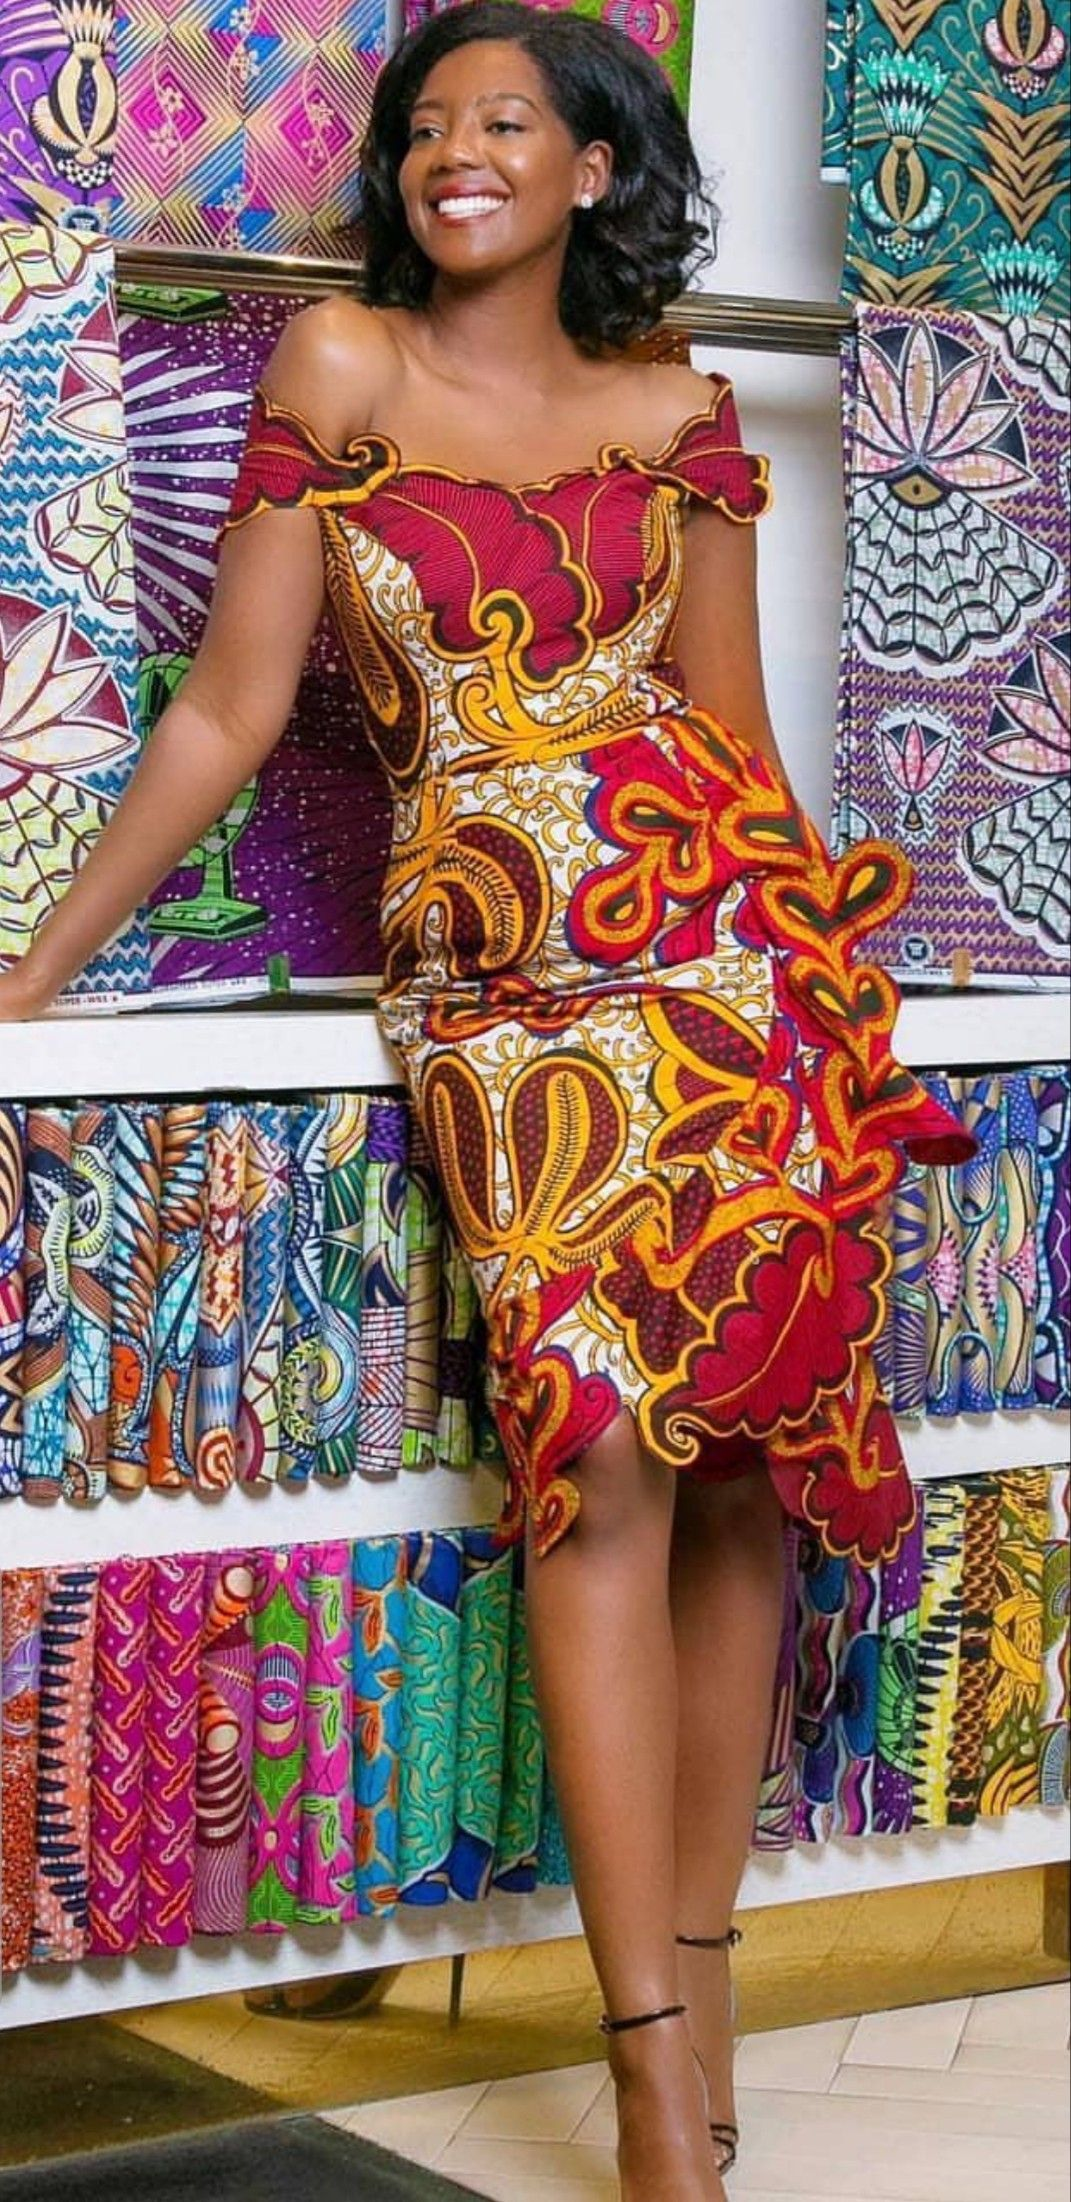 e1d7e21cbc7e21 Épinglé par aminata ndao sur wax tendance en 2019 | Robe africaine ...